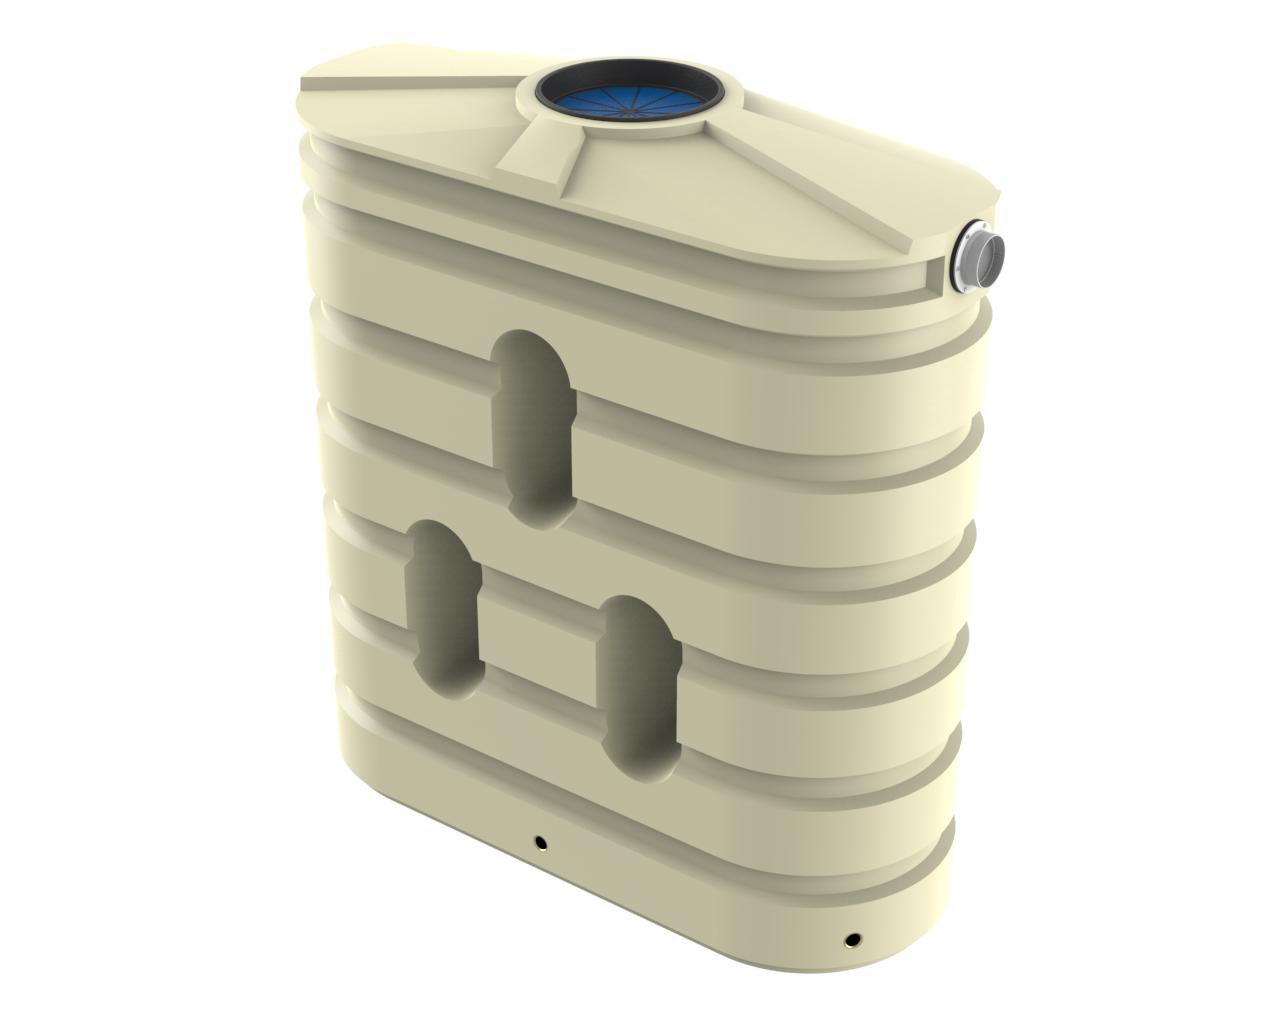 Bushmans Water Tanks Tank Supplies Hampton Park 3976 Fuel Filter Pic 5